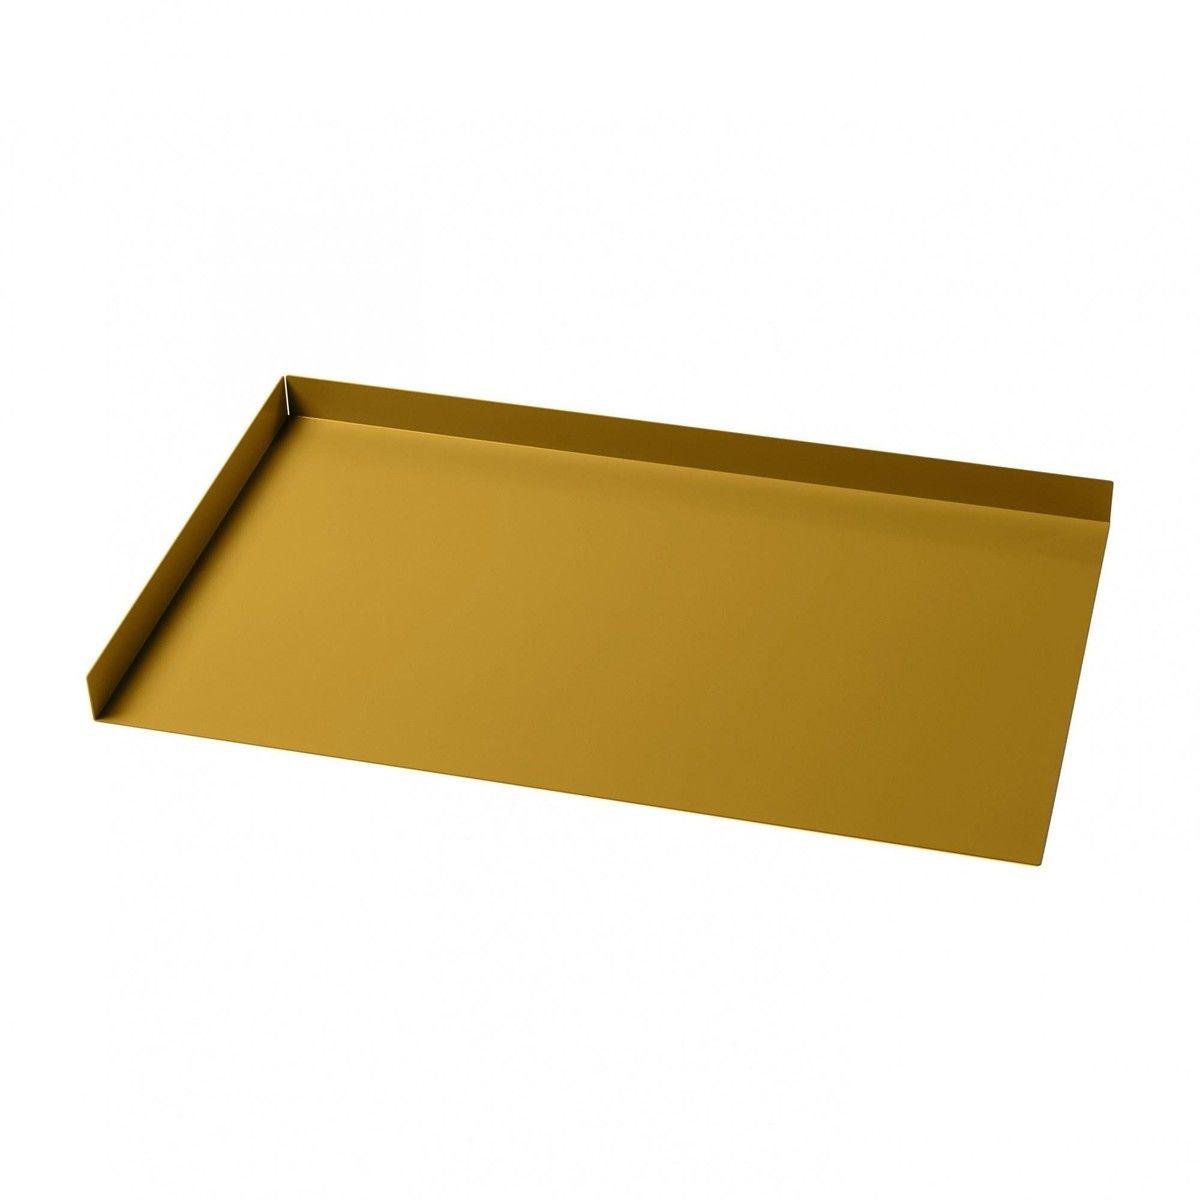 nex pur box auflage 80x48x4cm piure. Black Bedroom Furniture Sets. Home Design Ideas